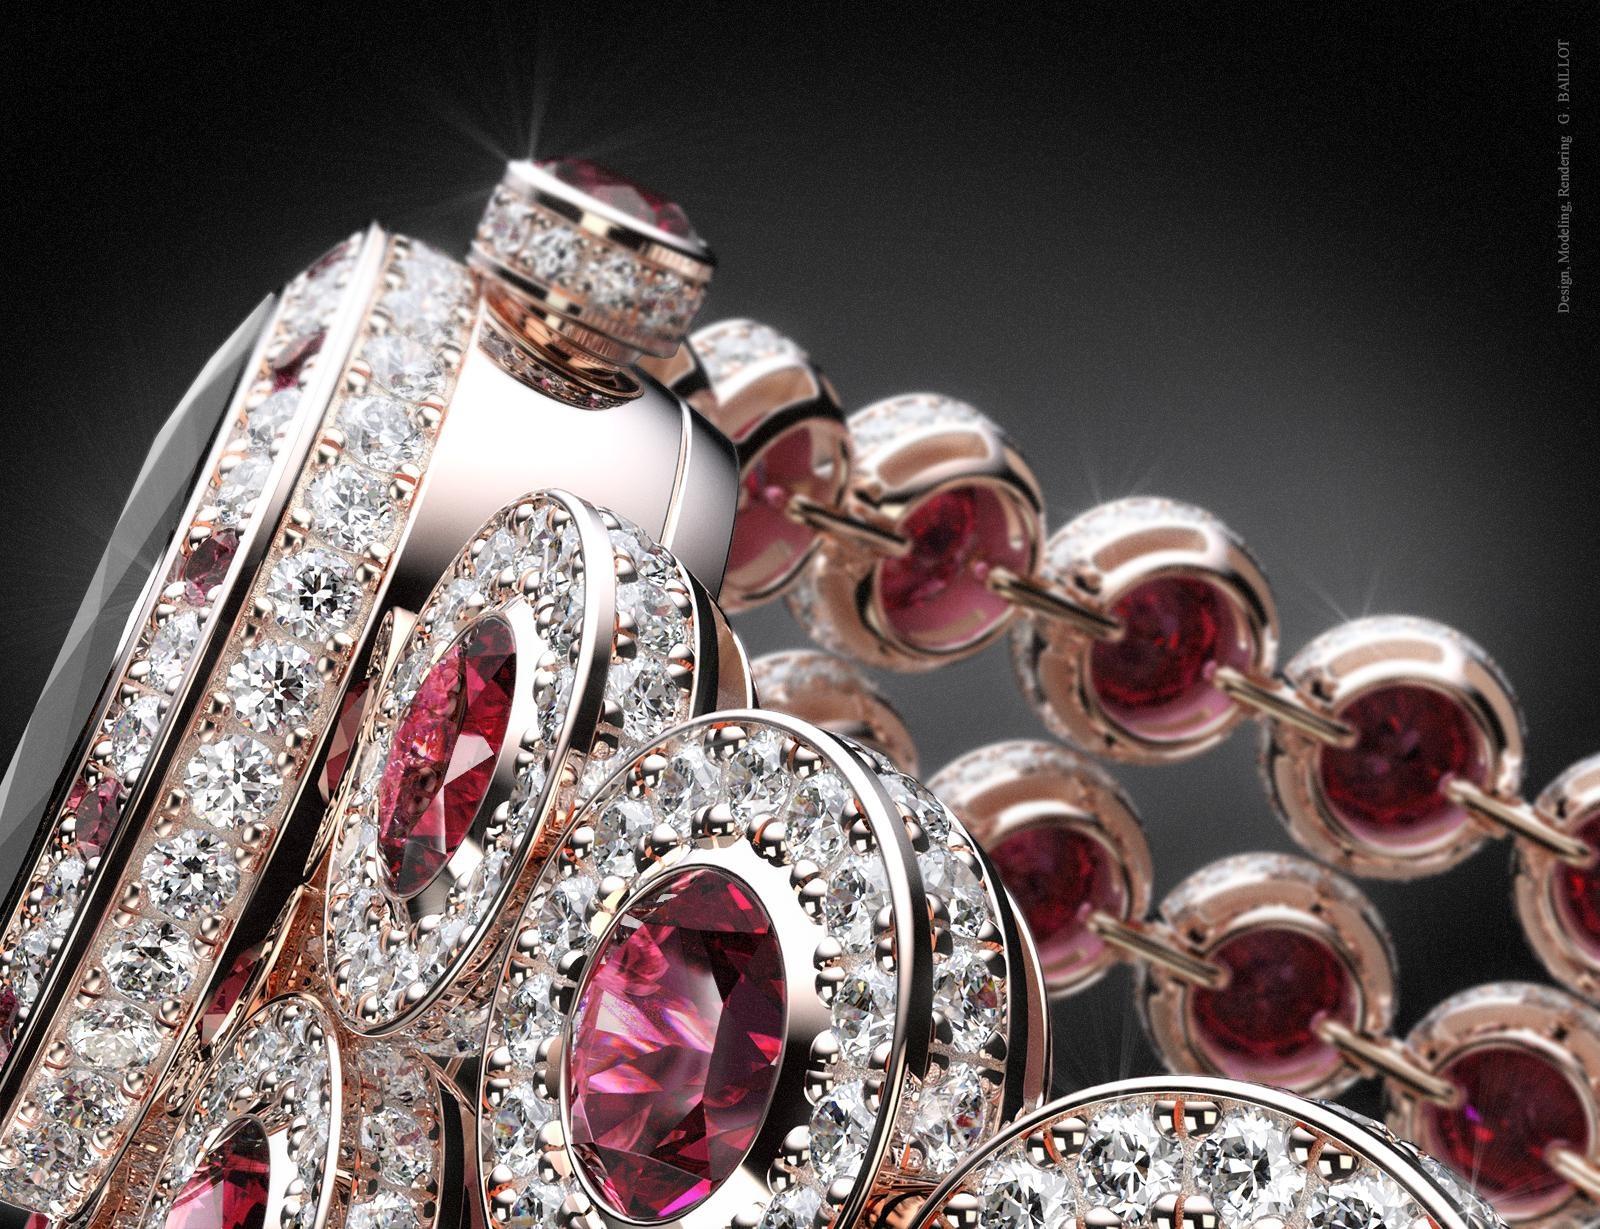 germain-baillot-keyshot-jewelry-blog-01